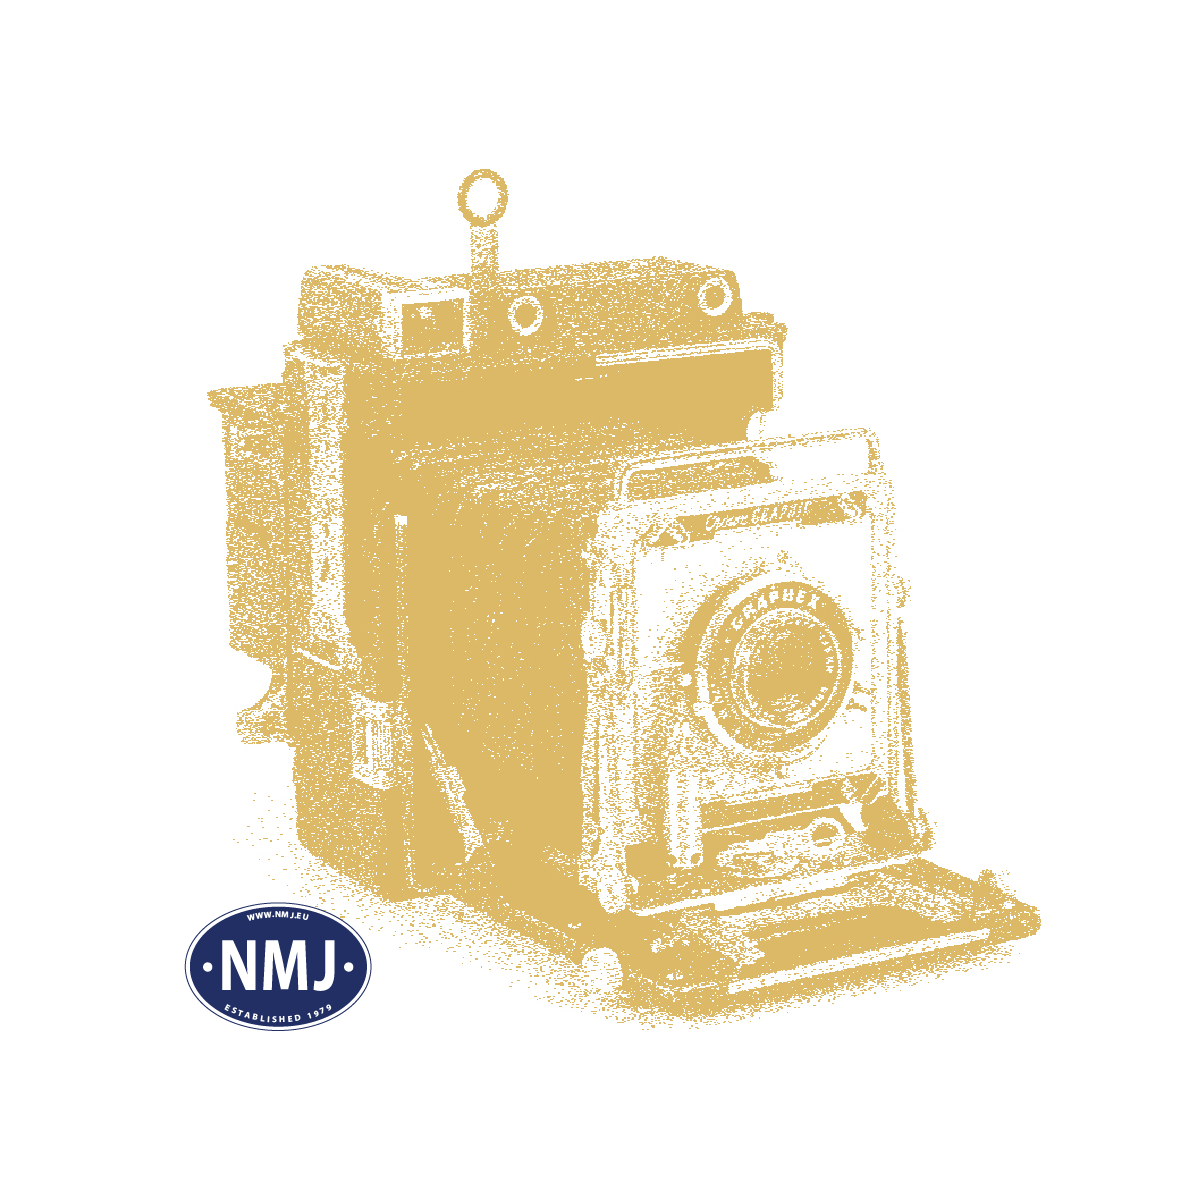 NMJT90202 - NMJ Topline MAV M61.010, Nohab, DCC m/ Sound